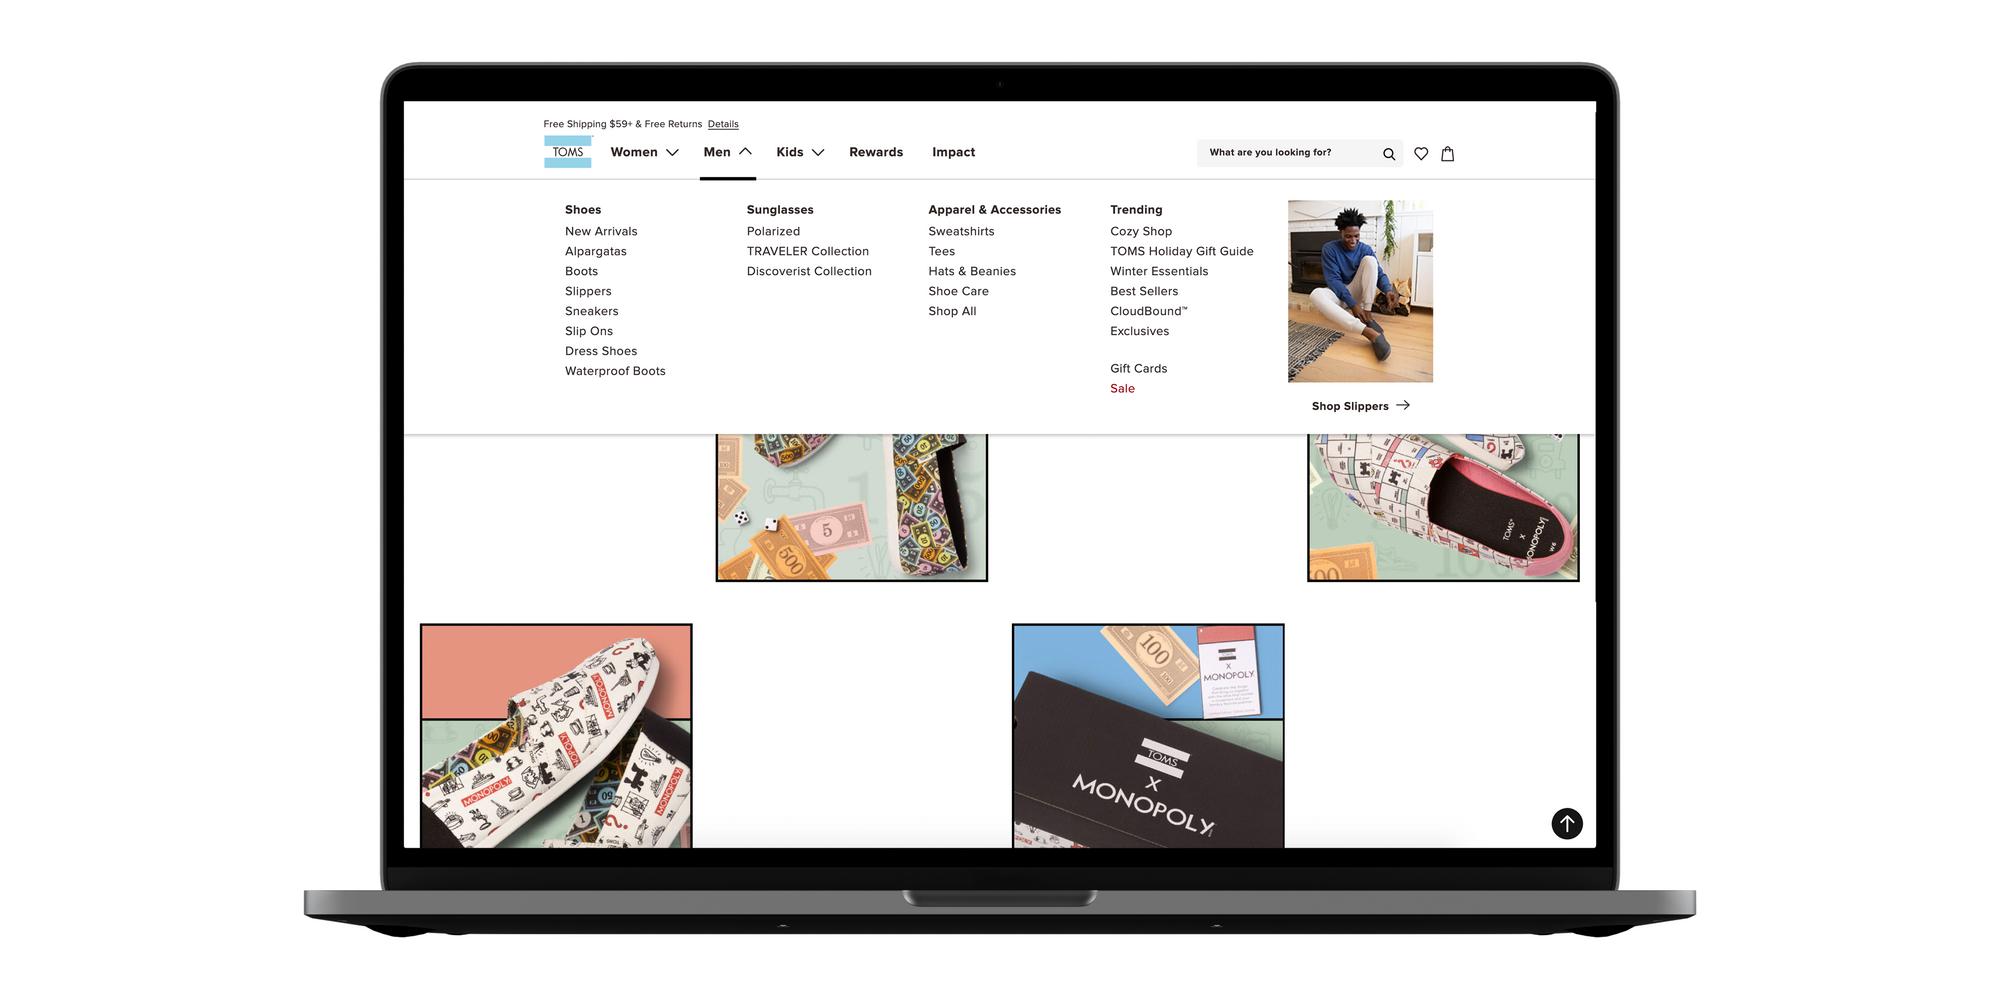 menu design on web site for eCommerce brand